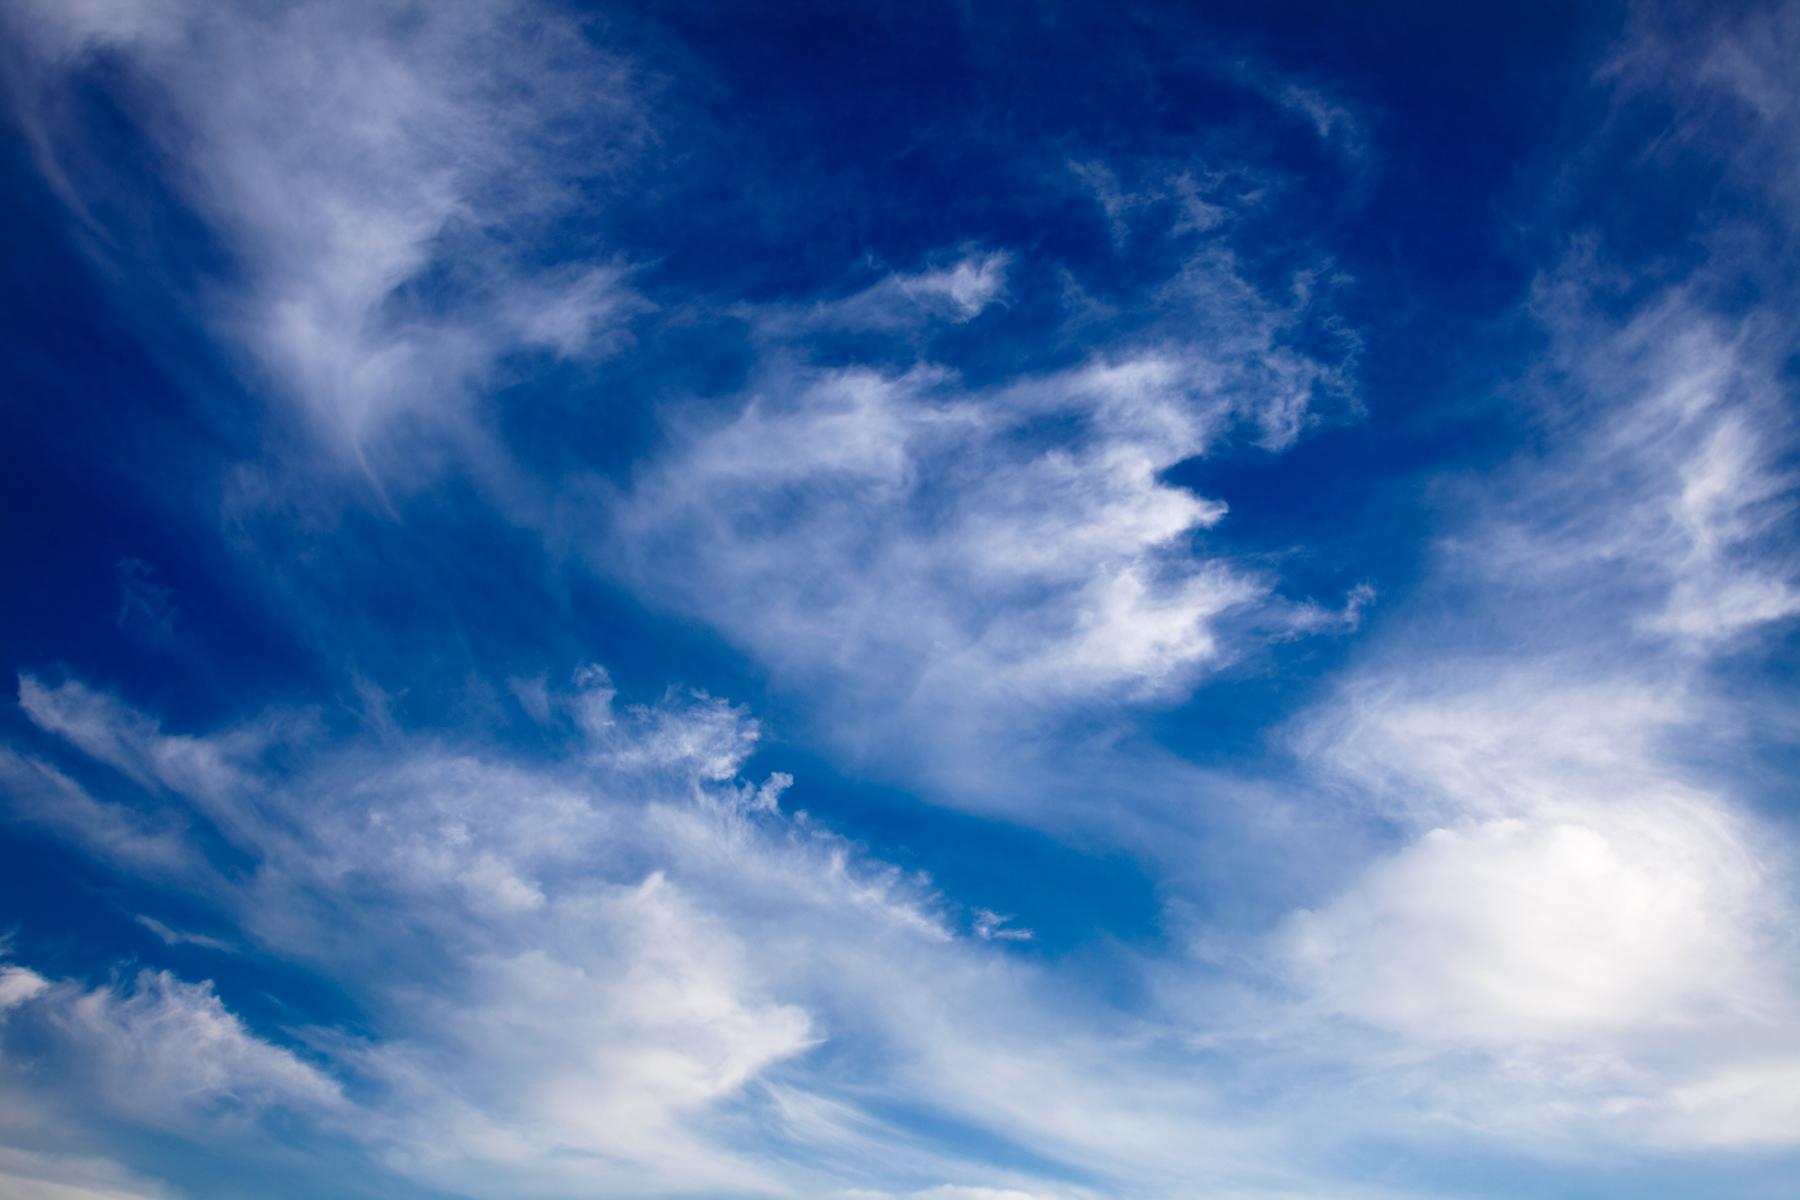 Cloudy Blue Sky, Backdrop, Somadjinn, Scenic, Shape, HQ Photo